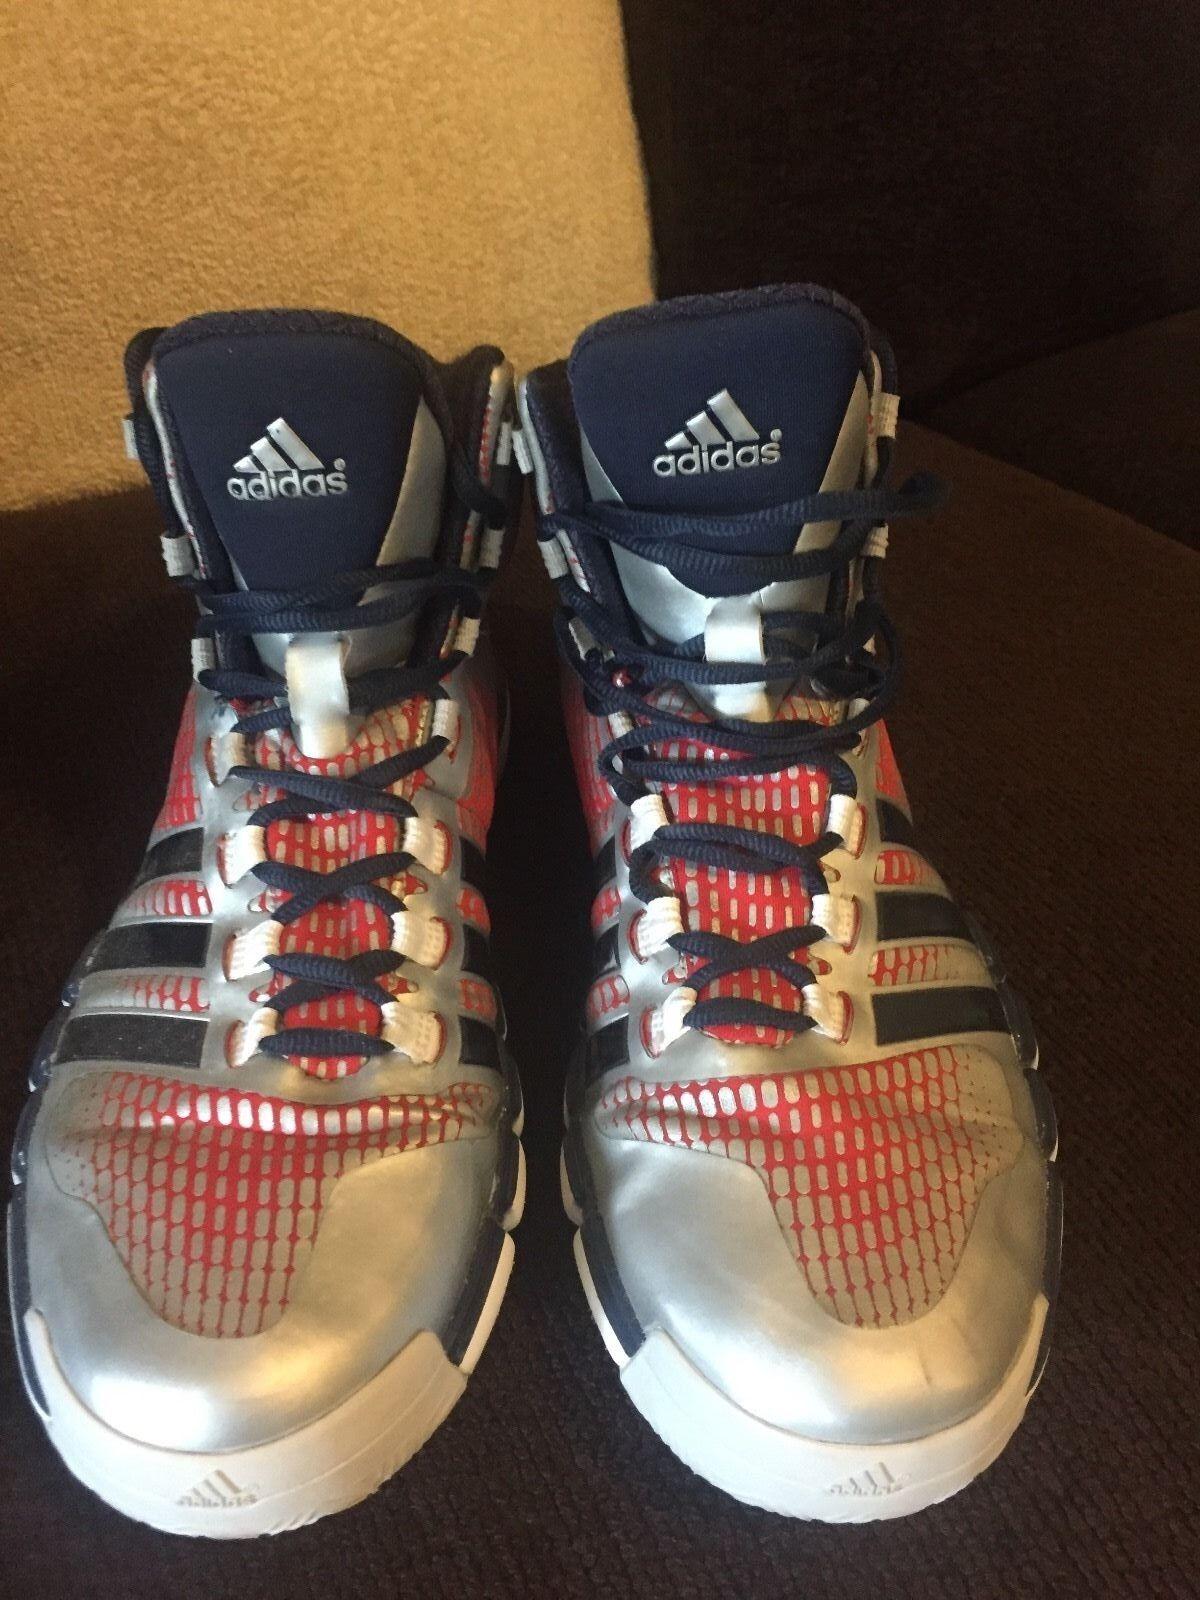 Adidas John shoes Wall CrazyQuick Silver/Blue/Red Basketball shoes John 6ad991